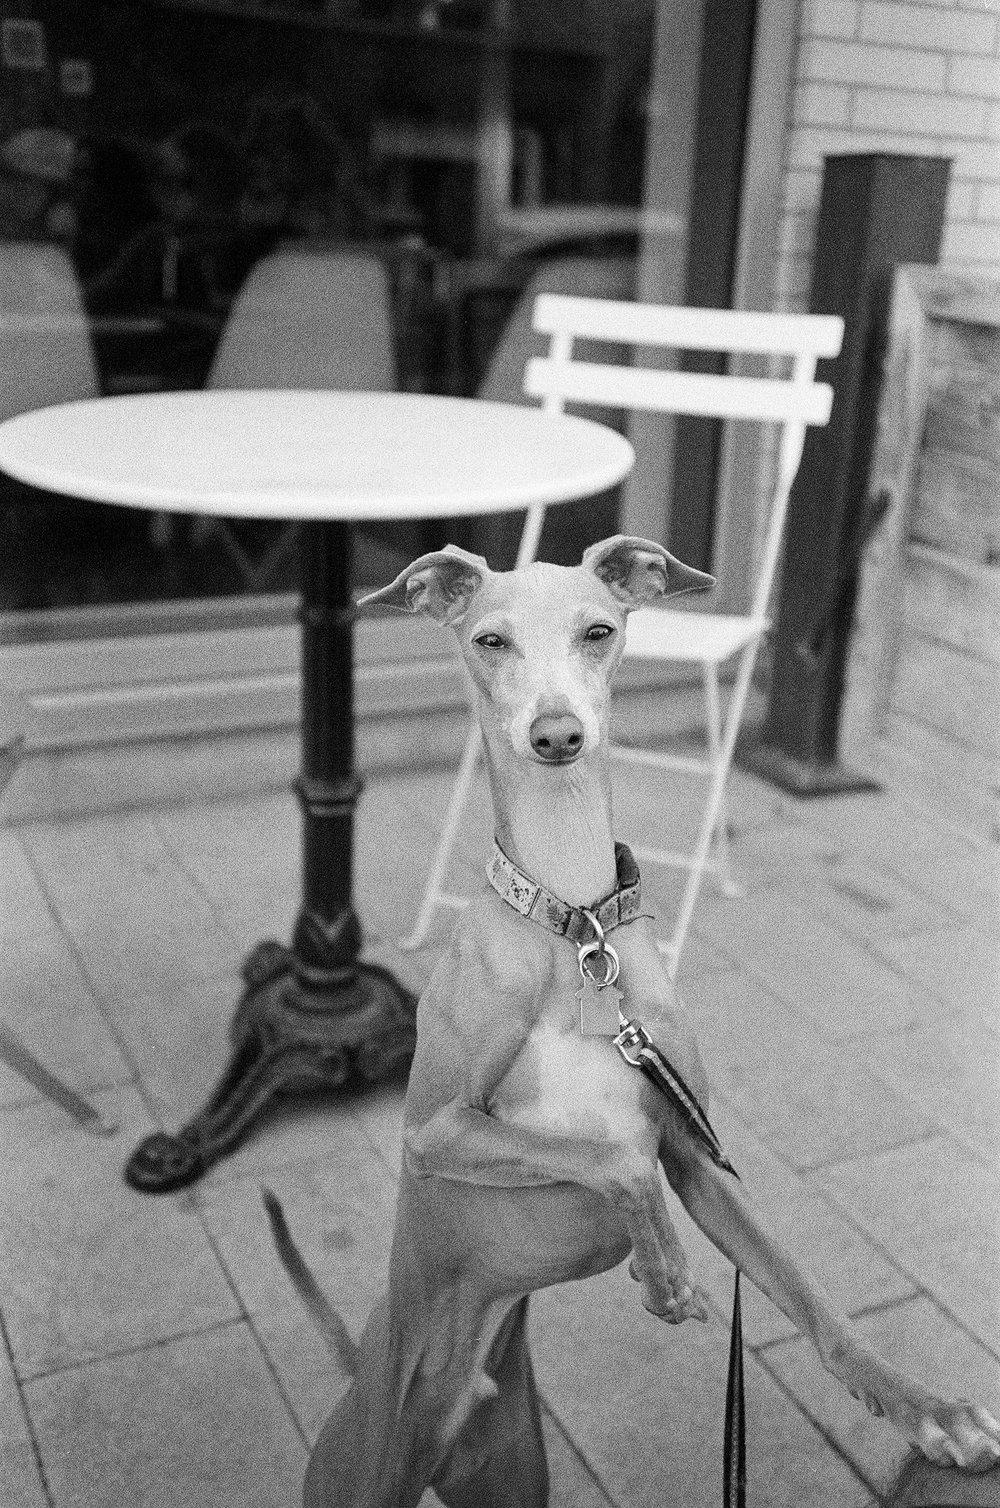 31-Cute-Italian-Greyhound-named-Dobby.jpg